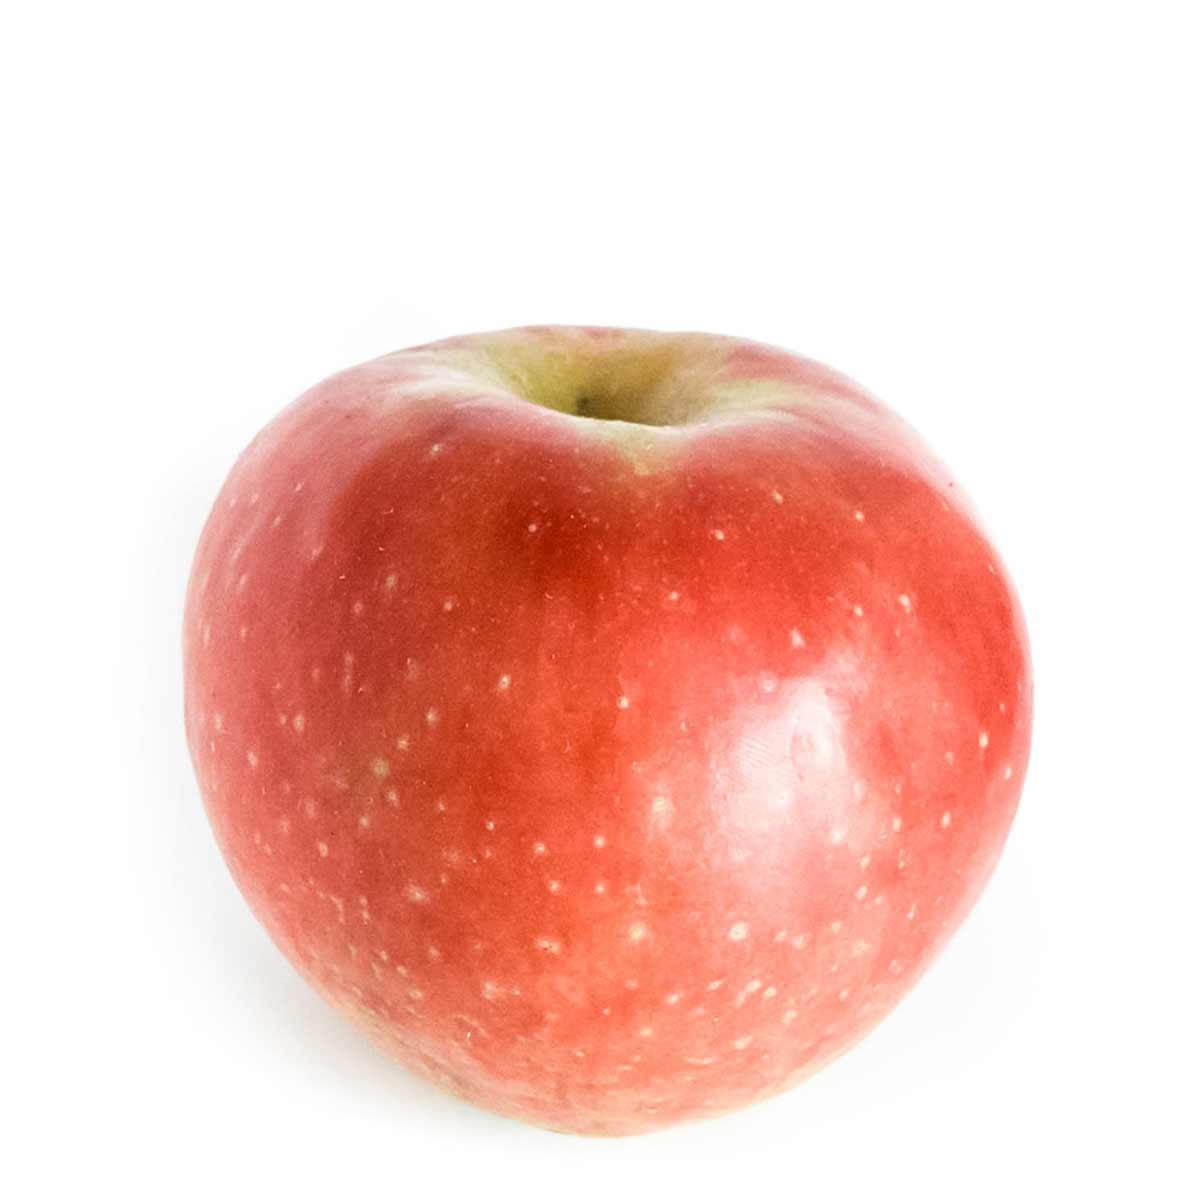 Swiss apple